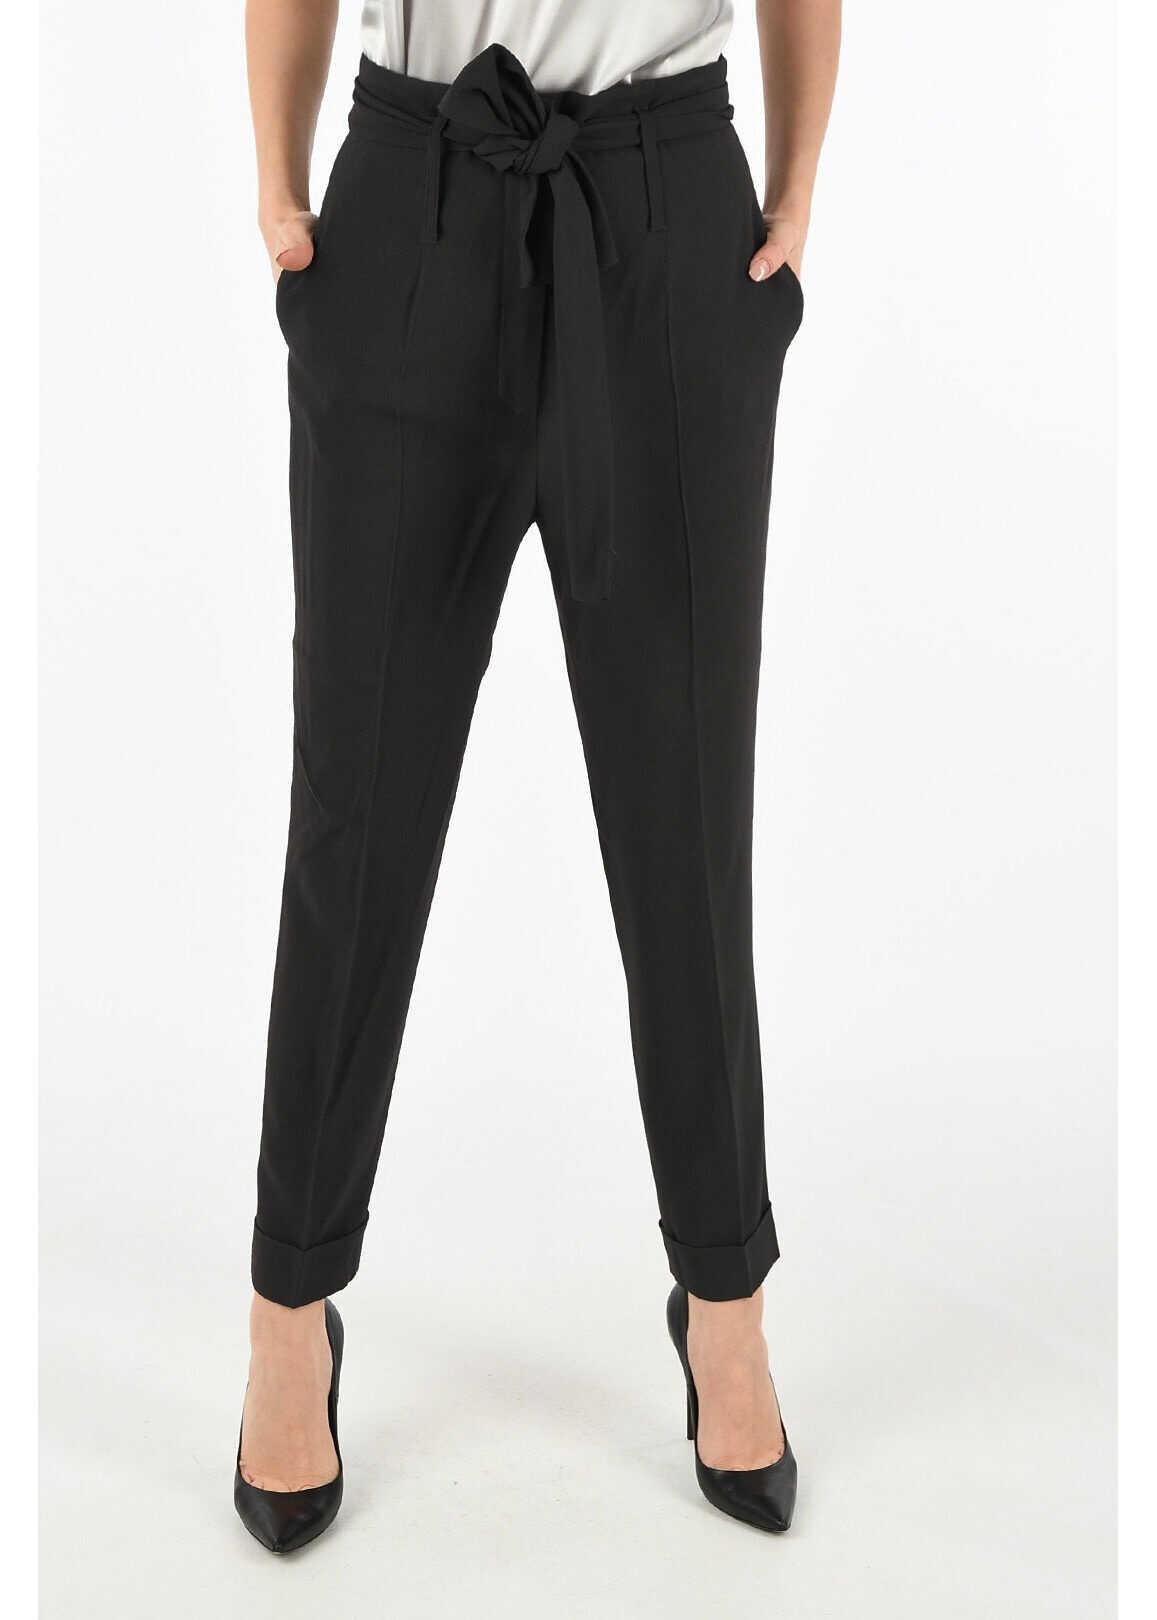 Fabiana Filippi high-rise waist pants GRAY